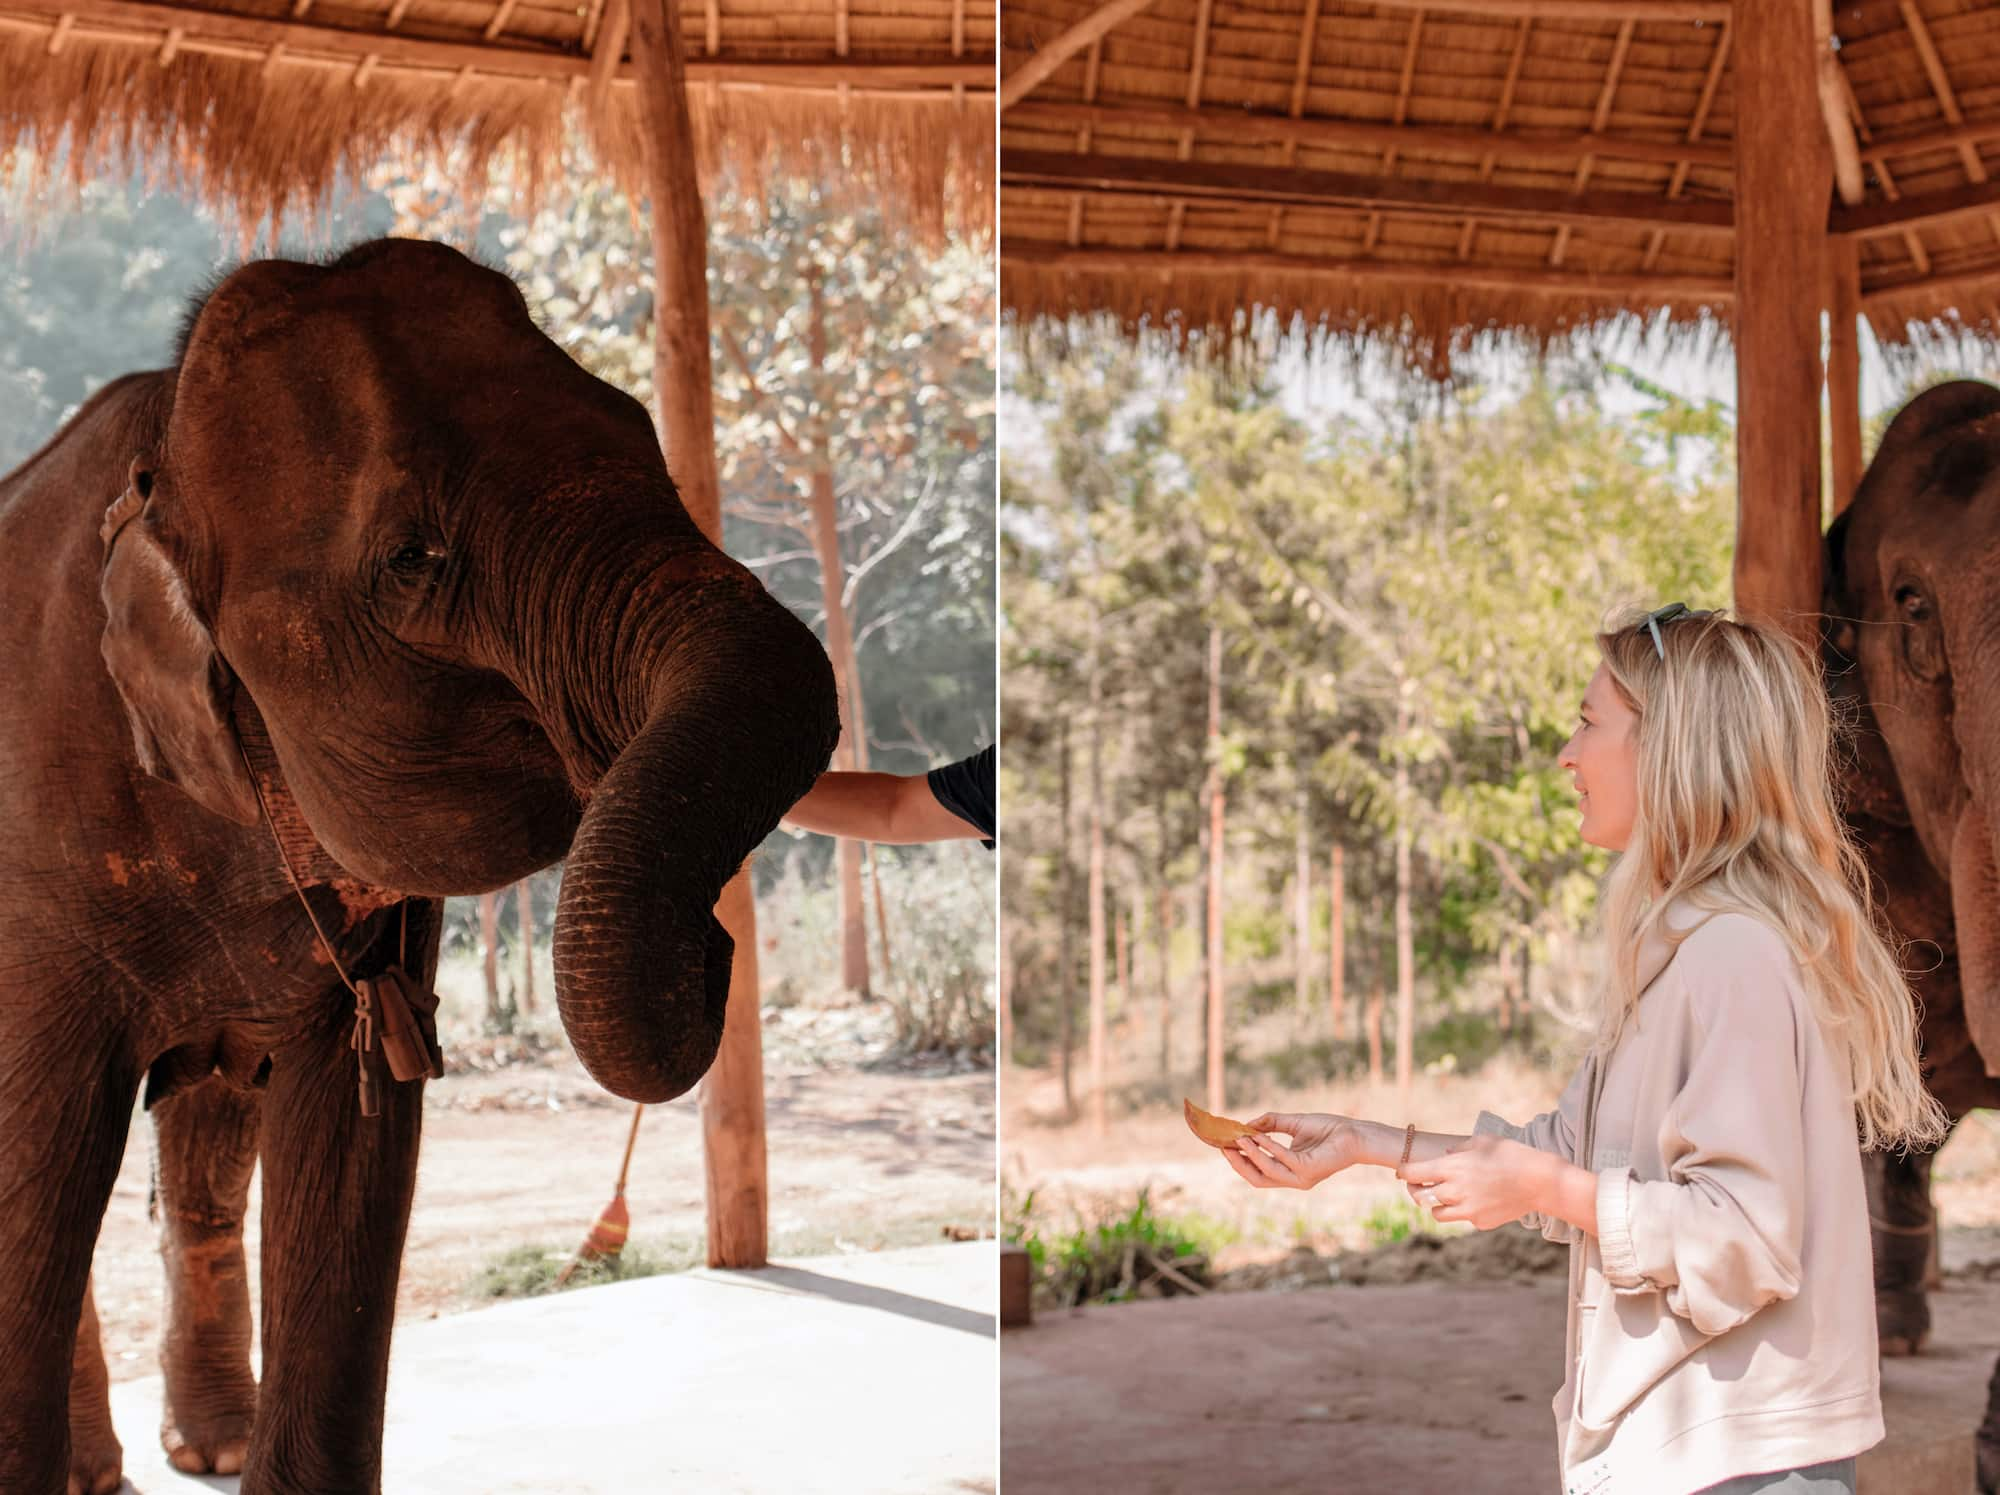 elefanten füttern myanmar